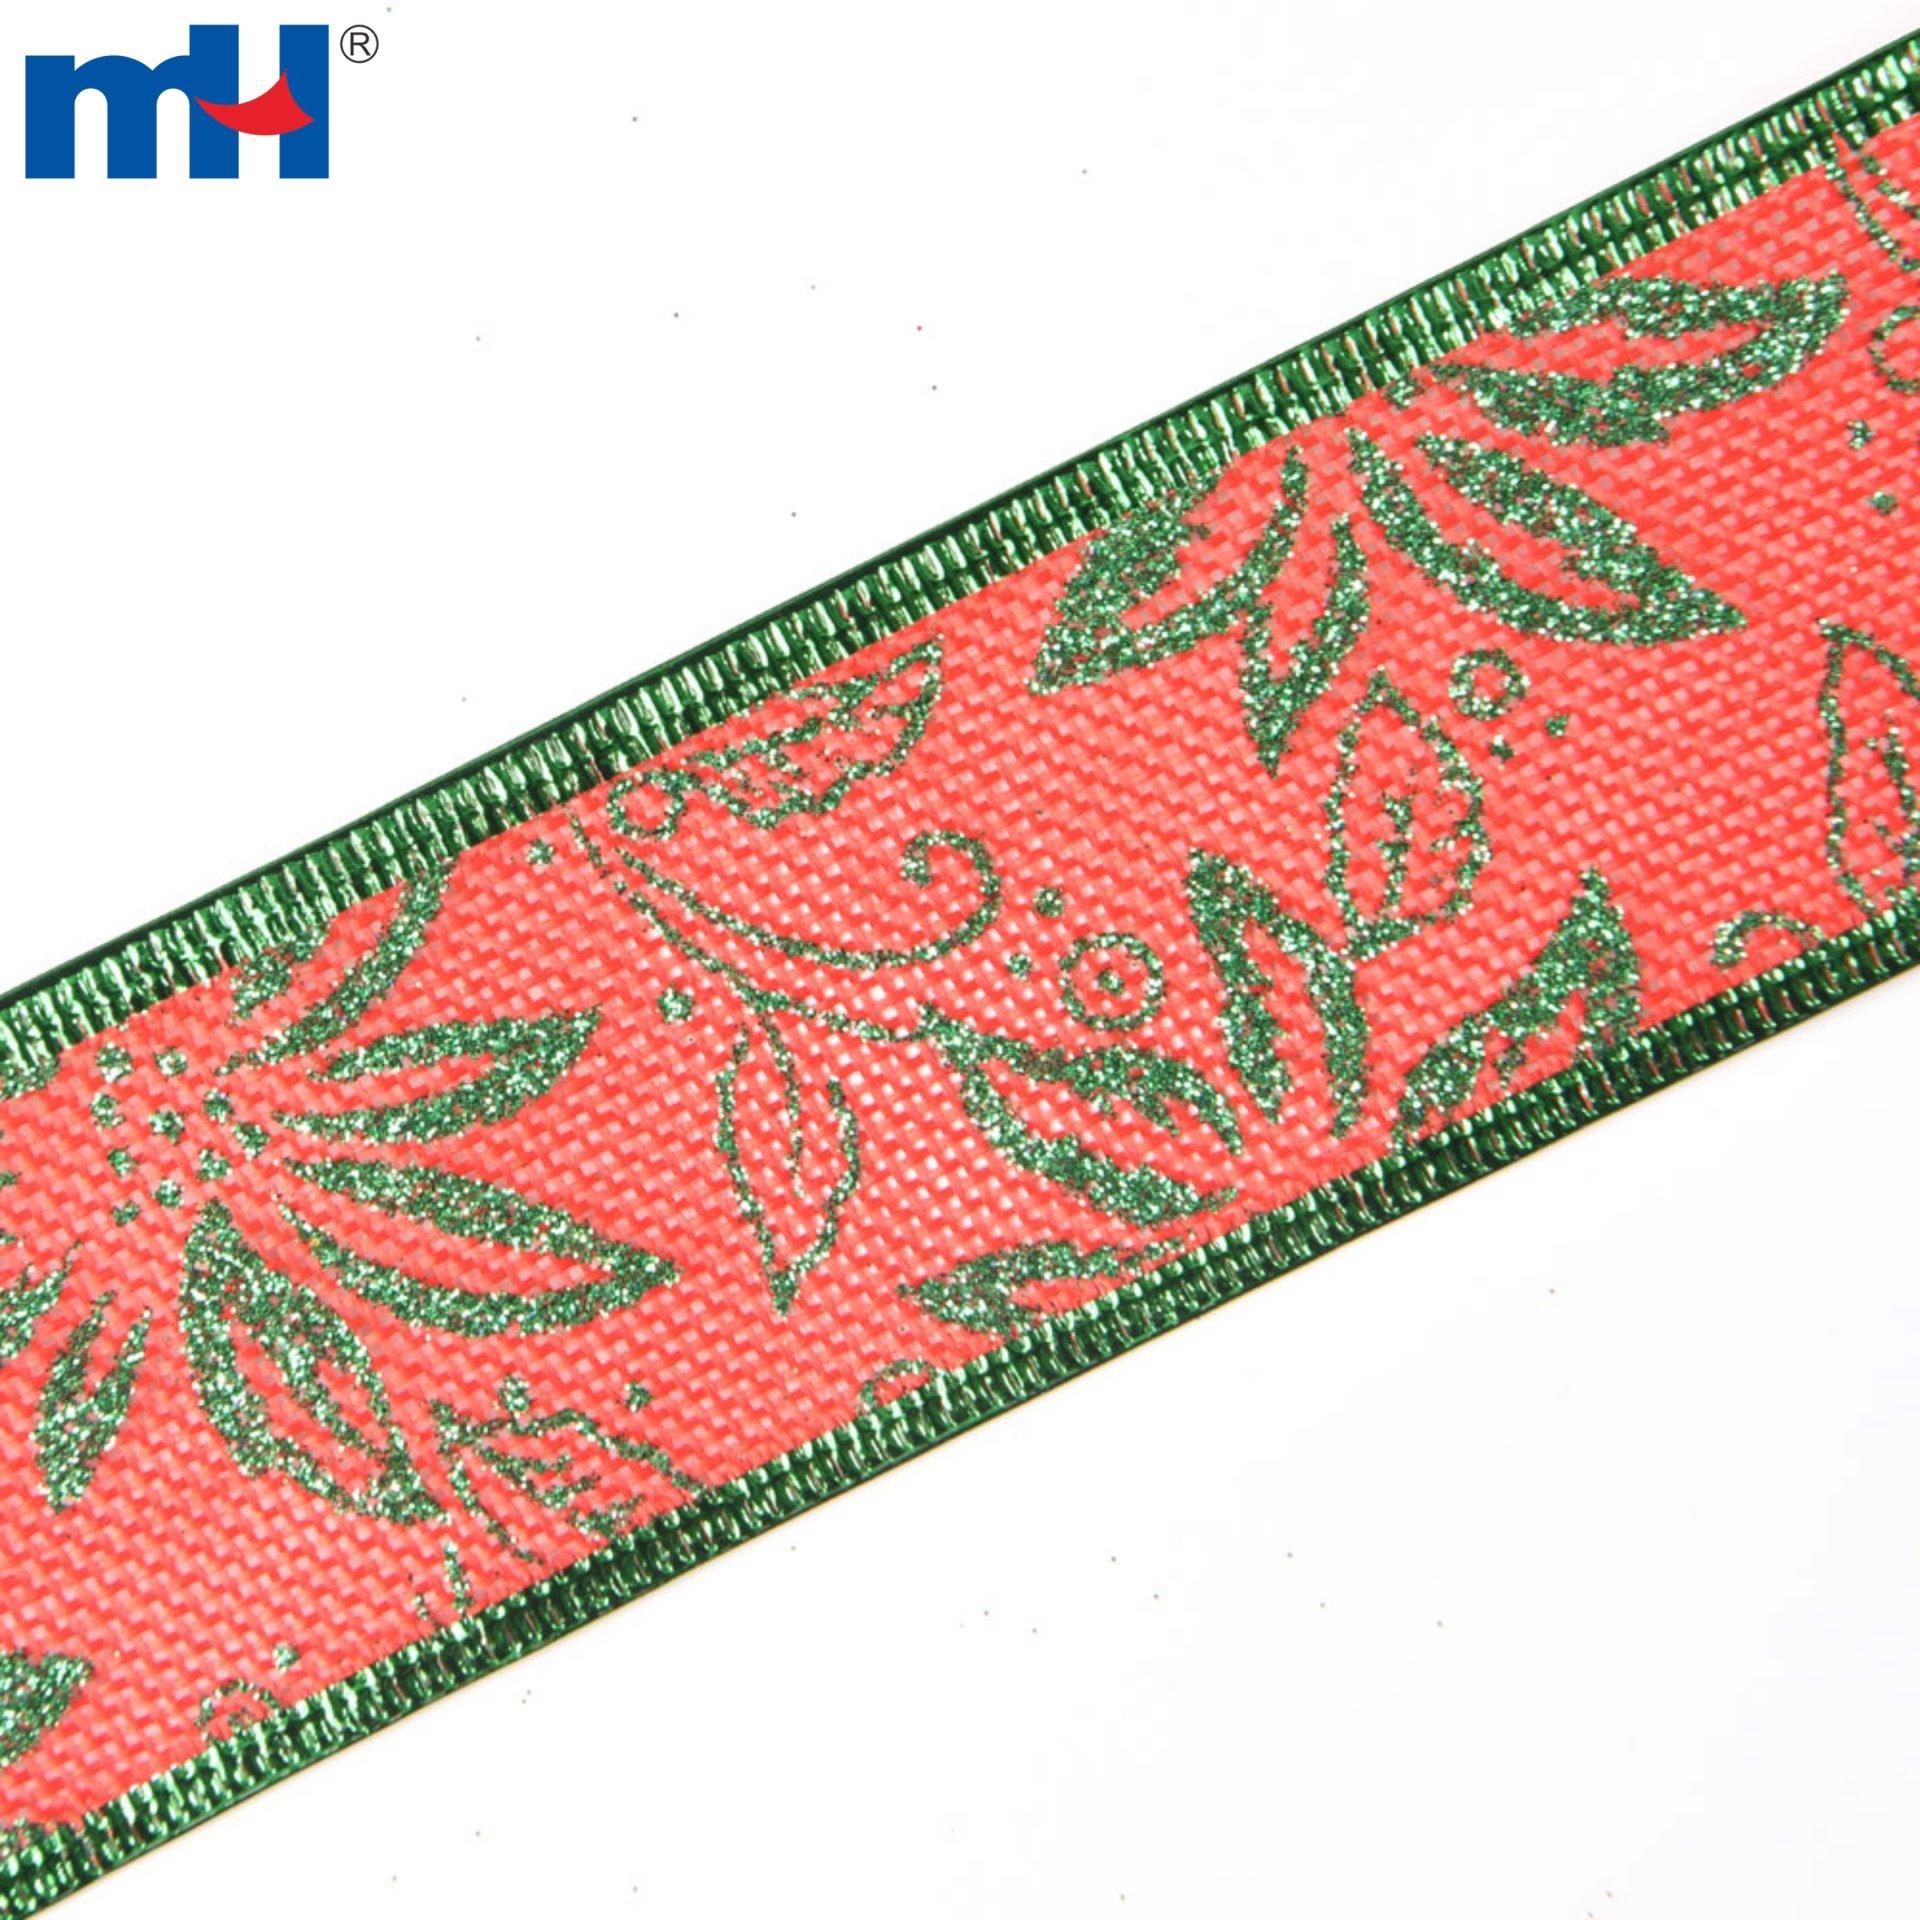 Burlap Christmas Tree Ribbons for Wreath Bows - Ningbo MH